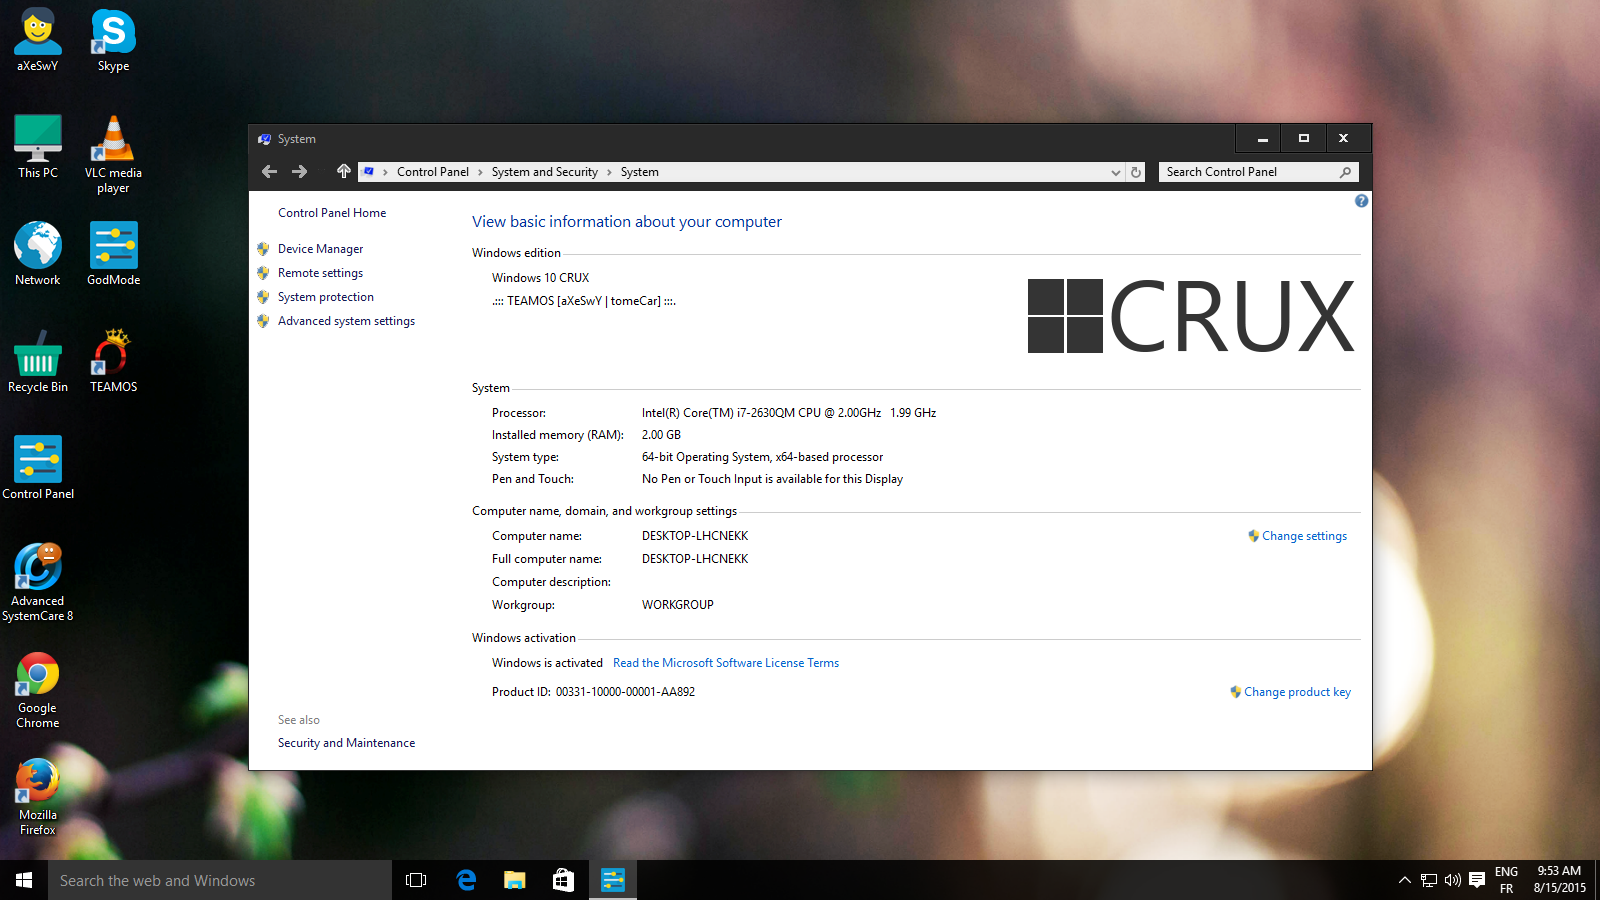 windows-10-crux-edition-x64-bit Actated ISO ลิงค์เดียว แรง ...